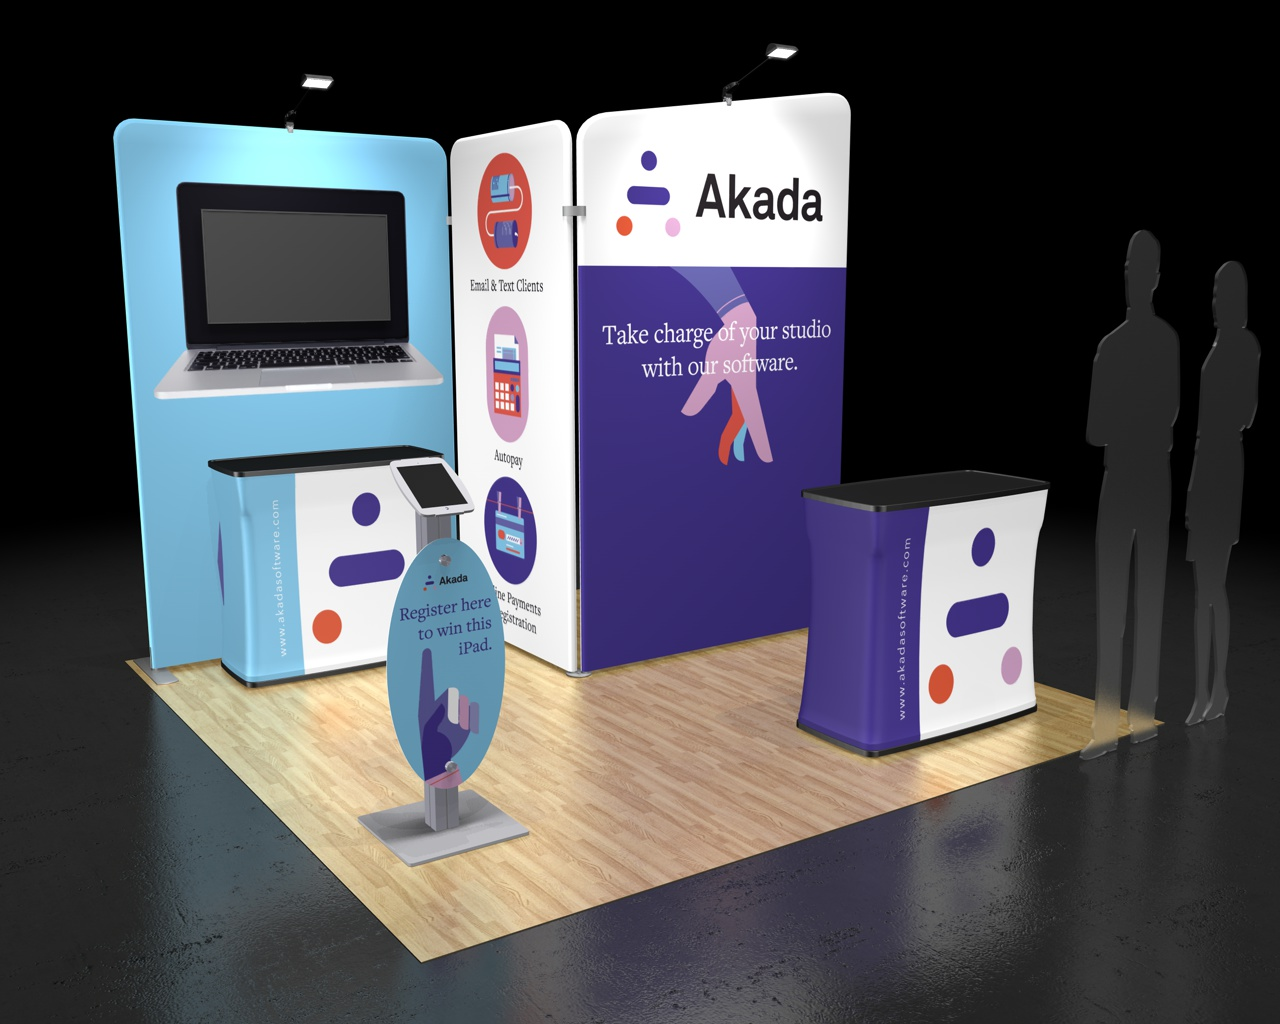 Akada